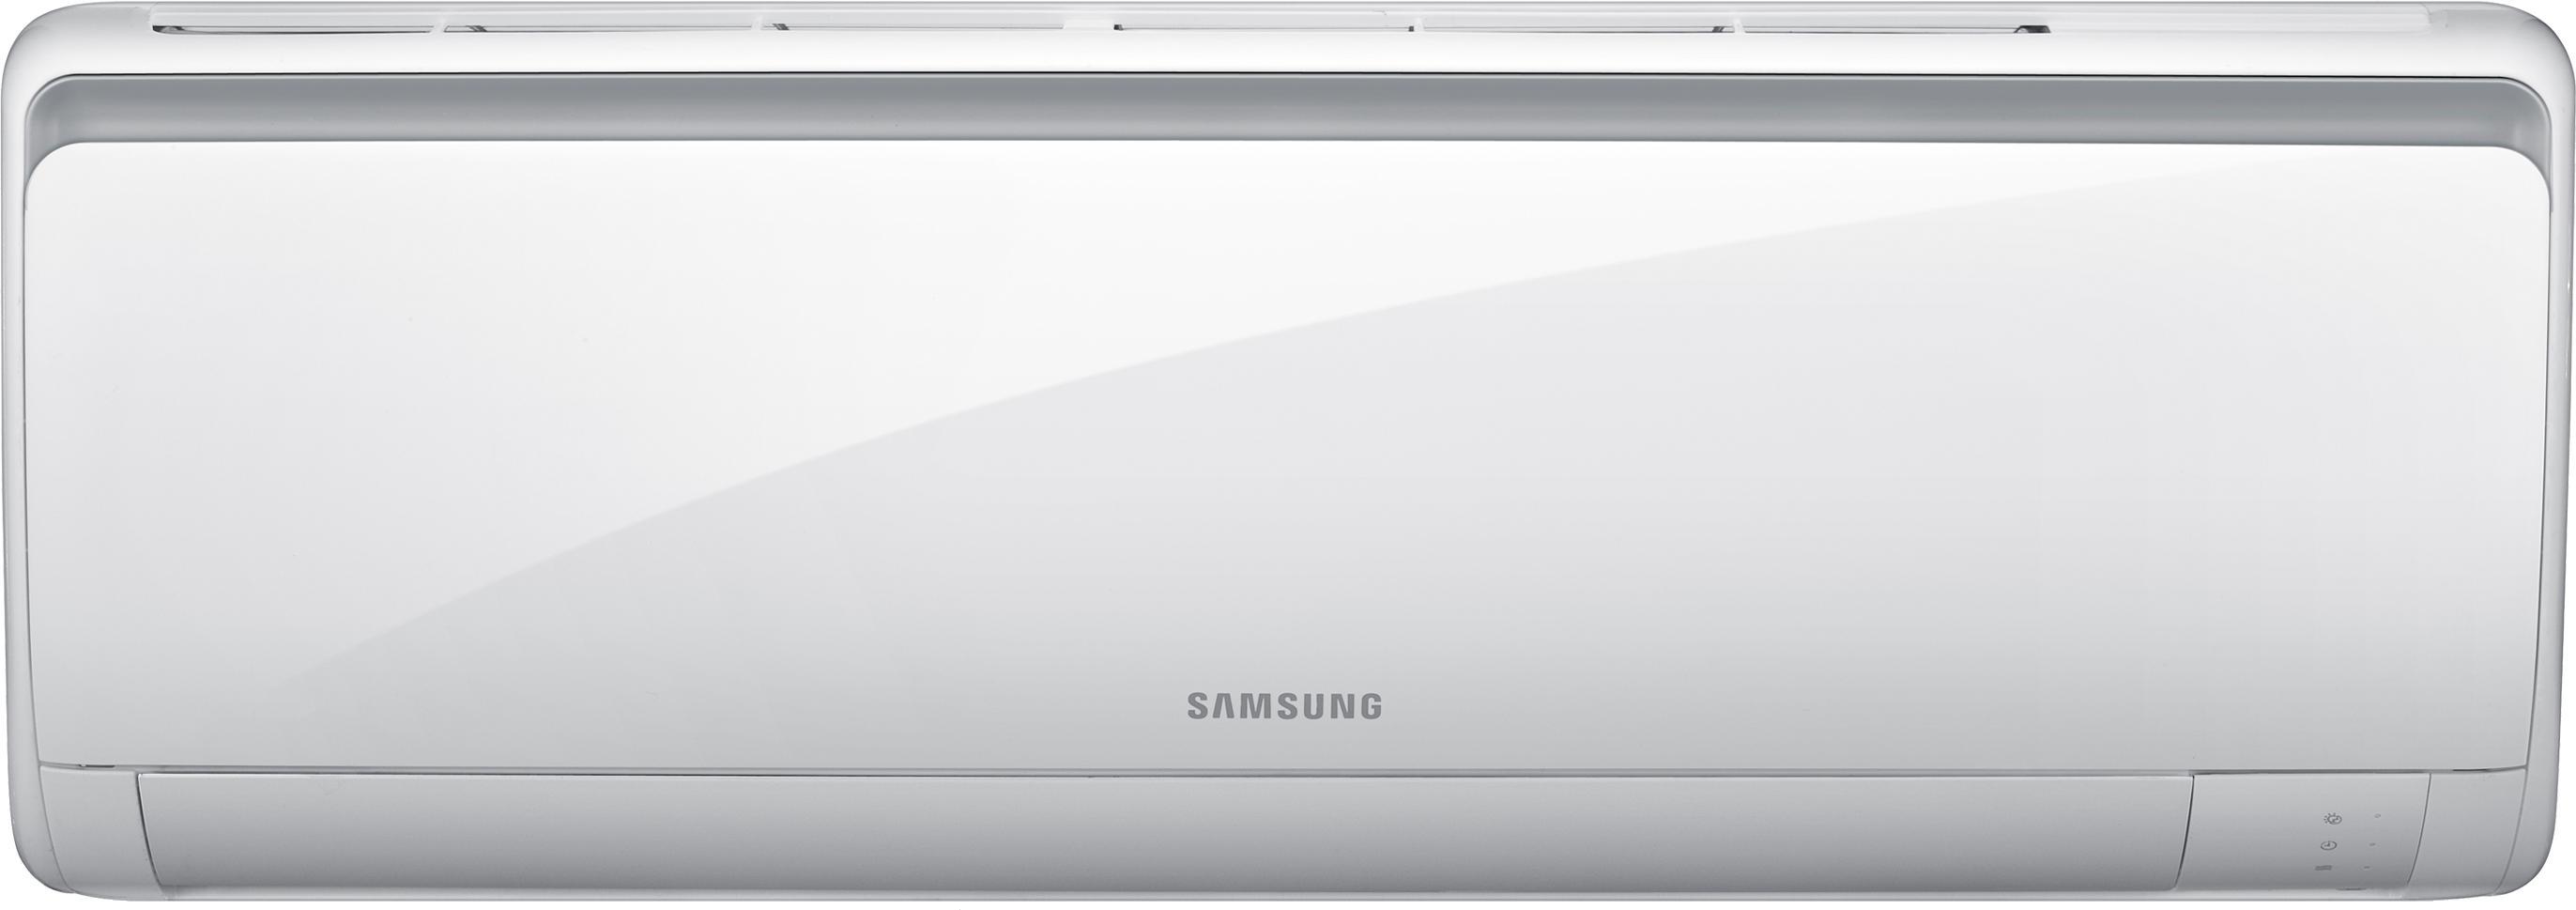 Samsung AQV18PSL